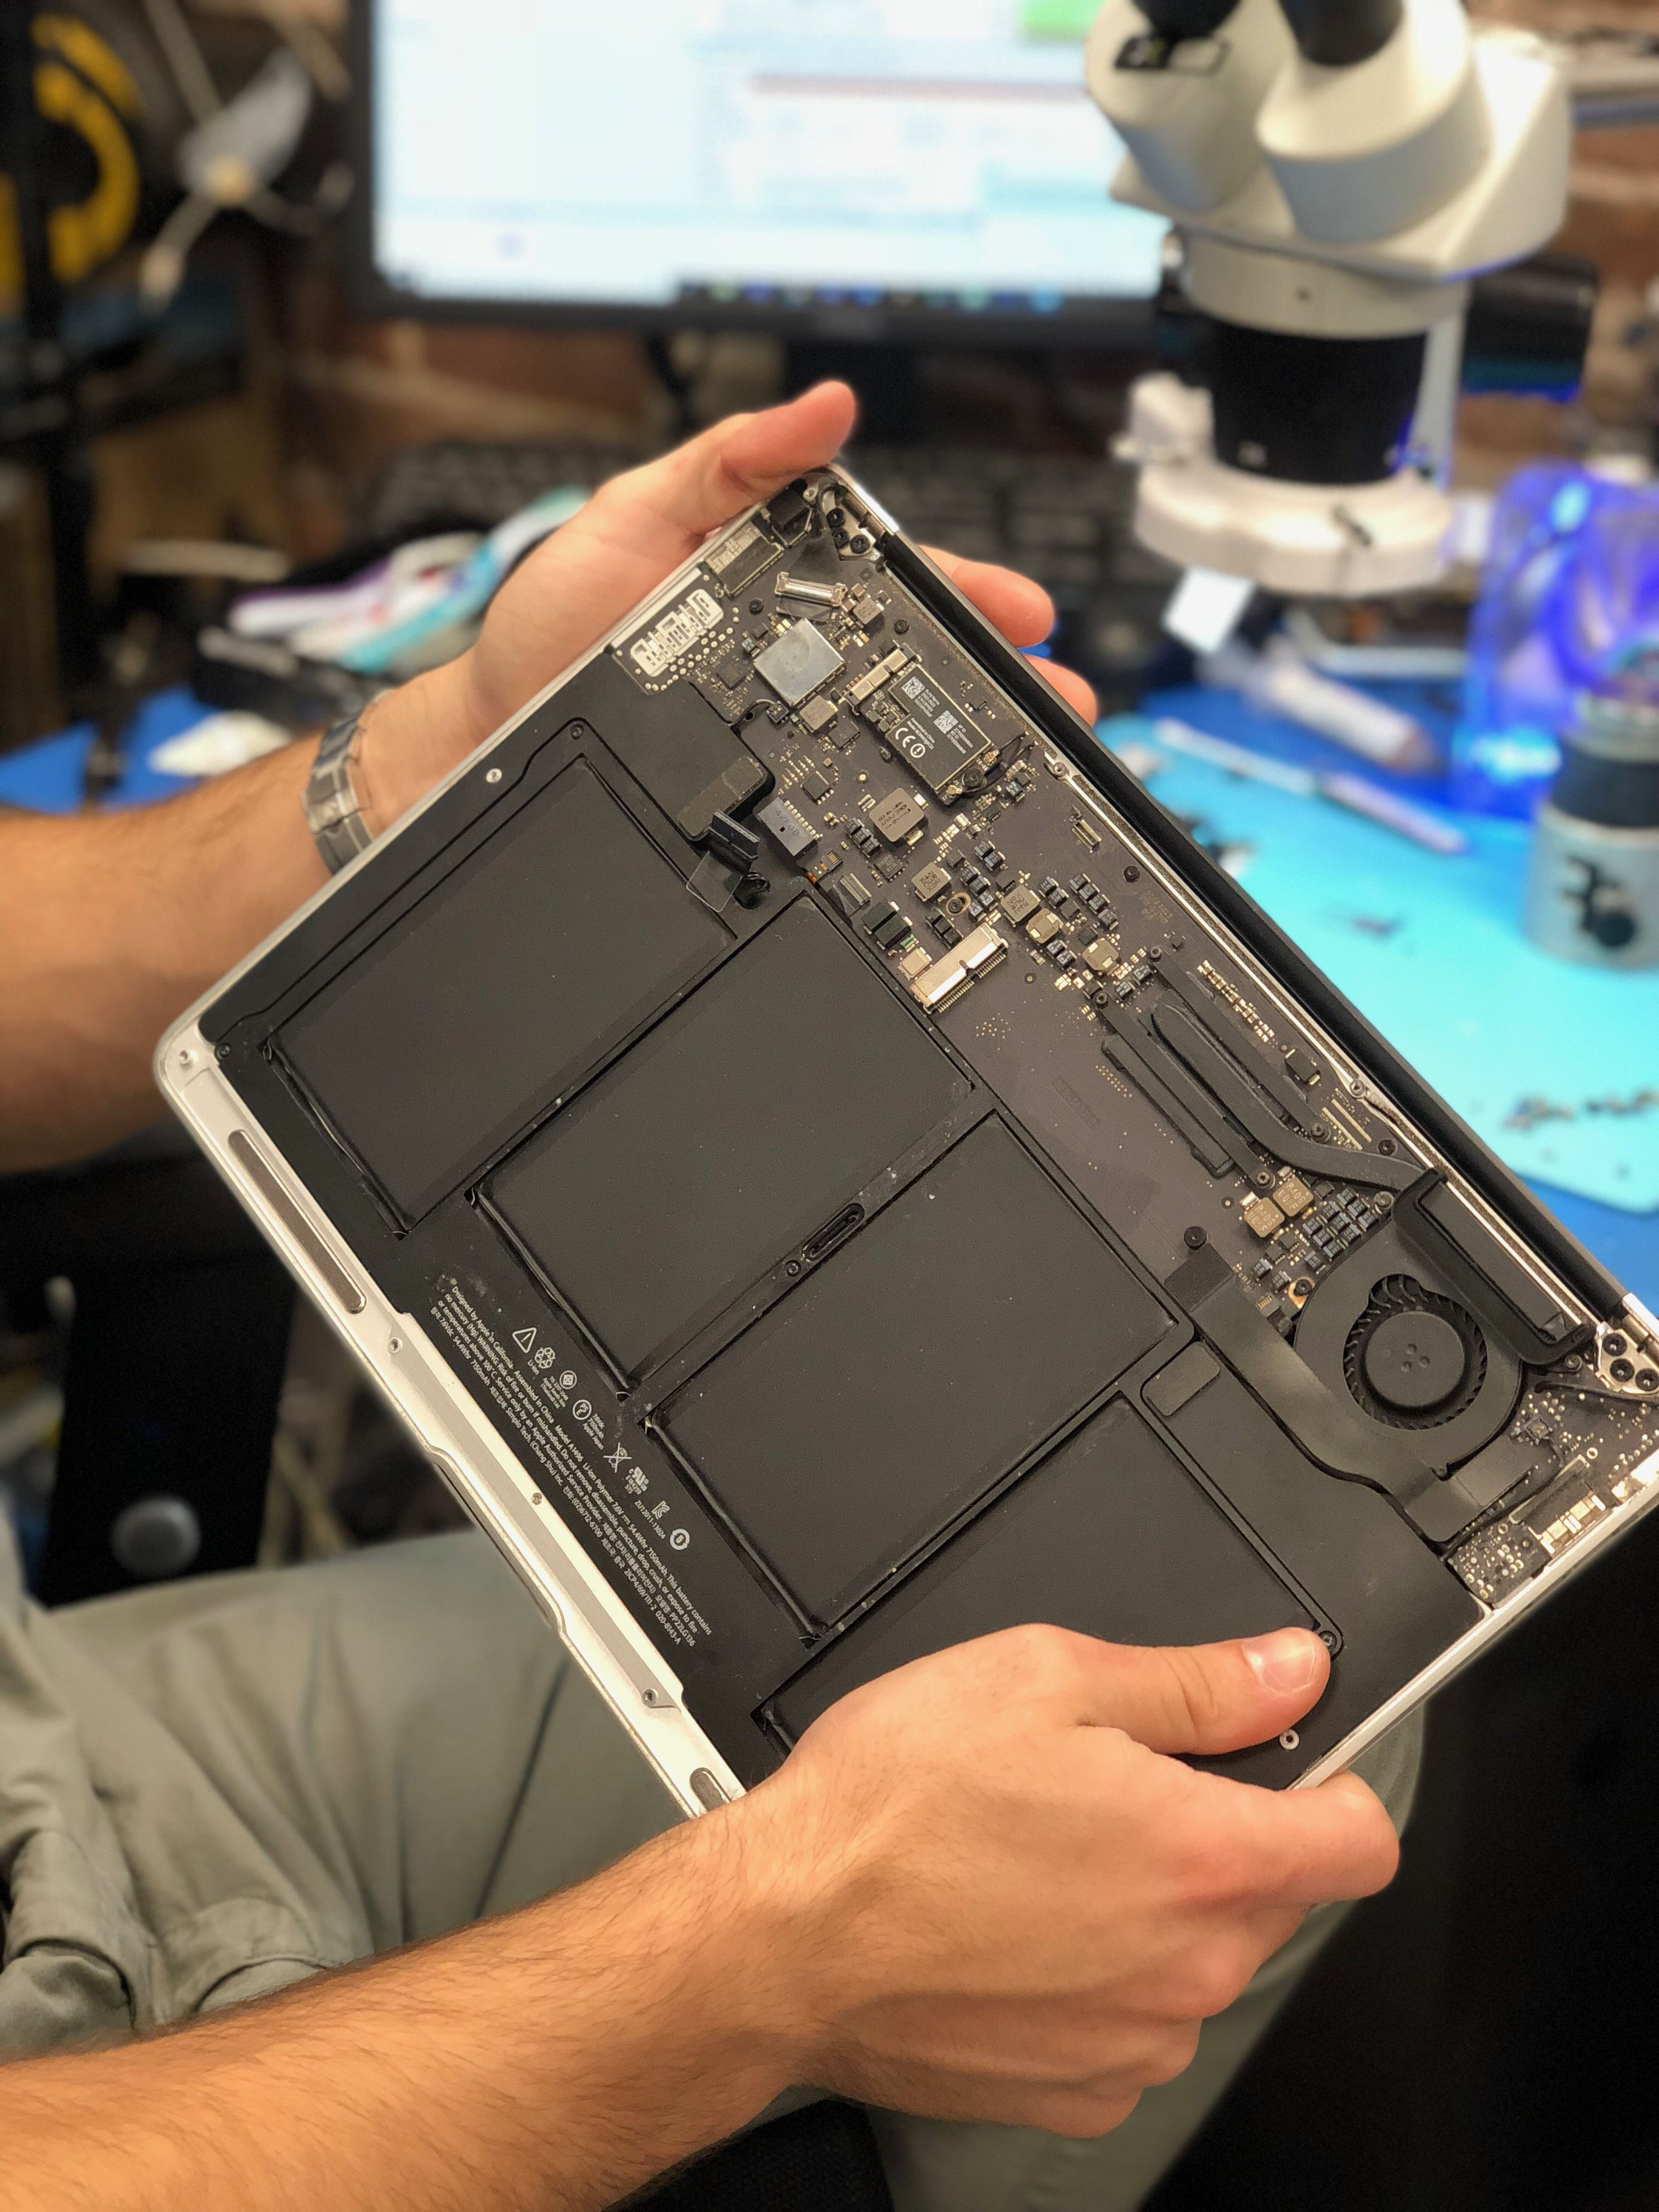 Macbook pro repair macbook repair macbook macbook pro